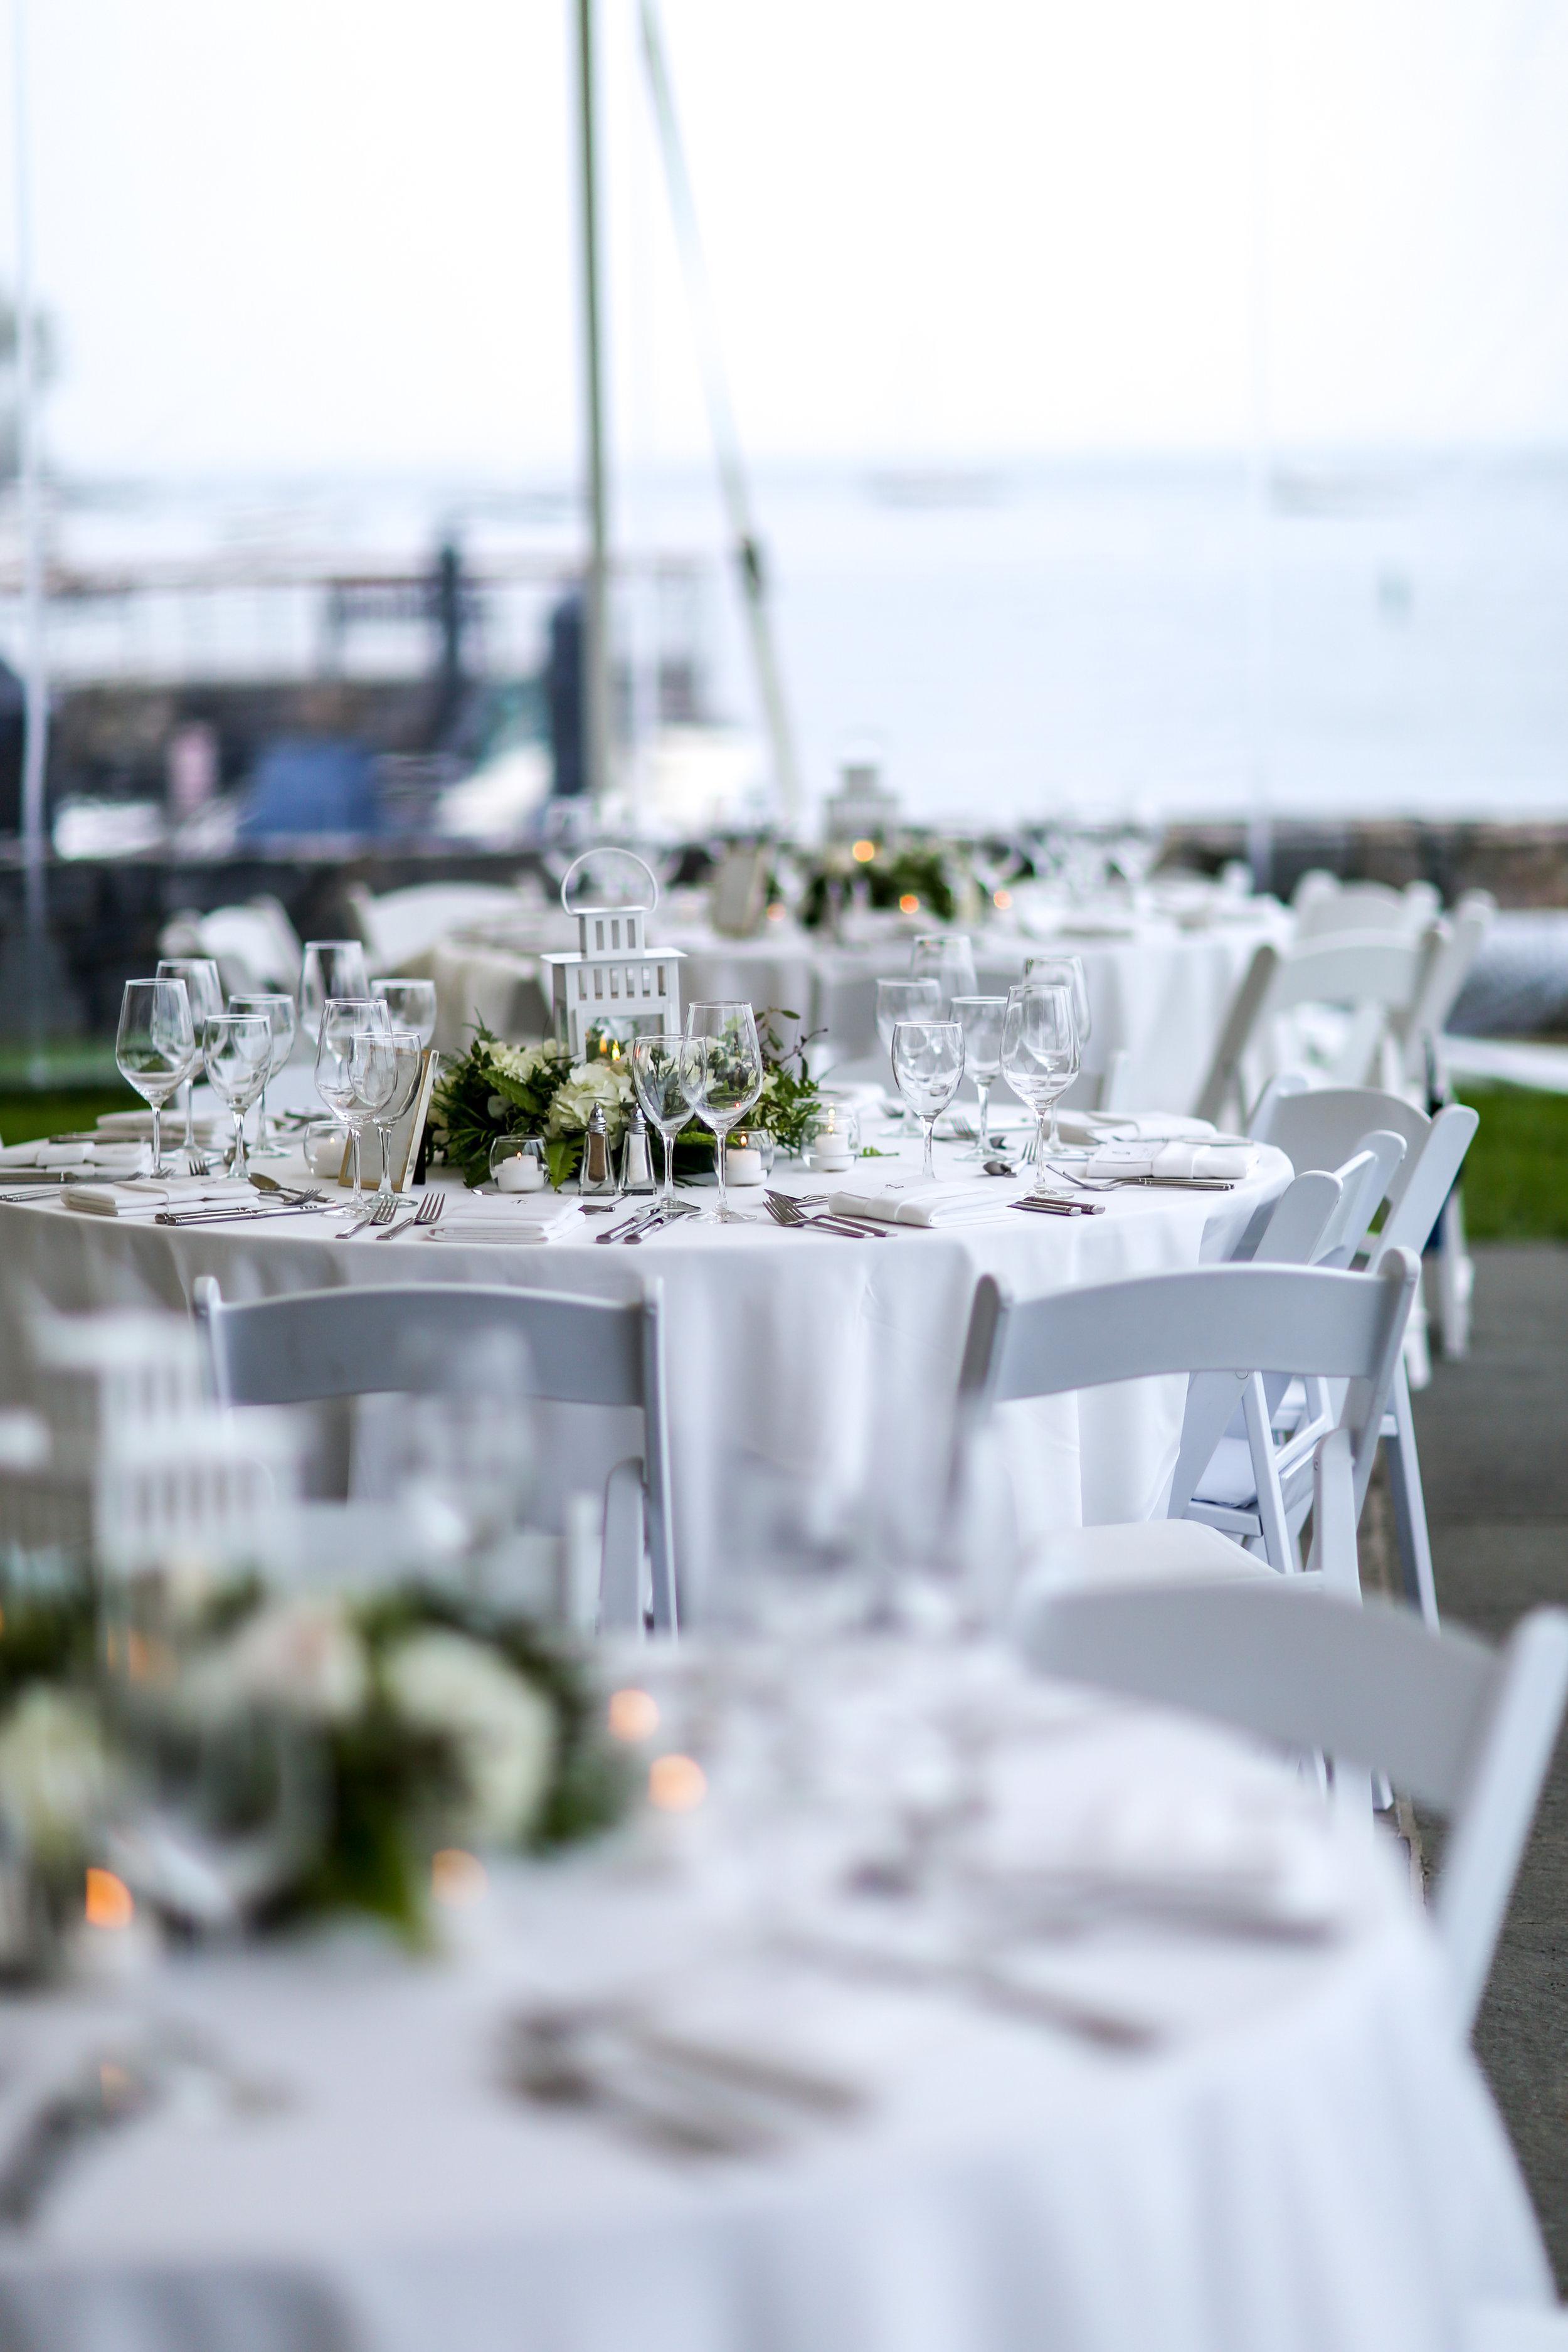 Jeremie_Barlow_Photography_Steffen_Sudyam_wedding_2018-766.jpg